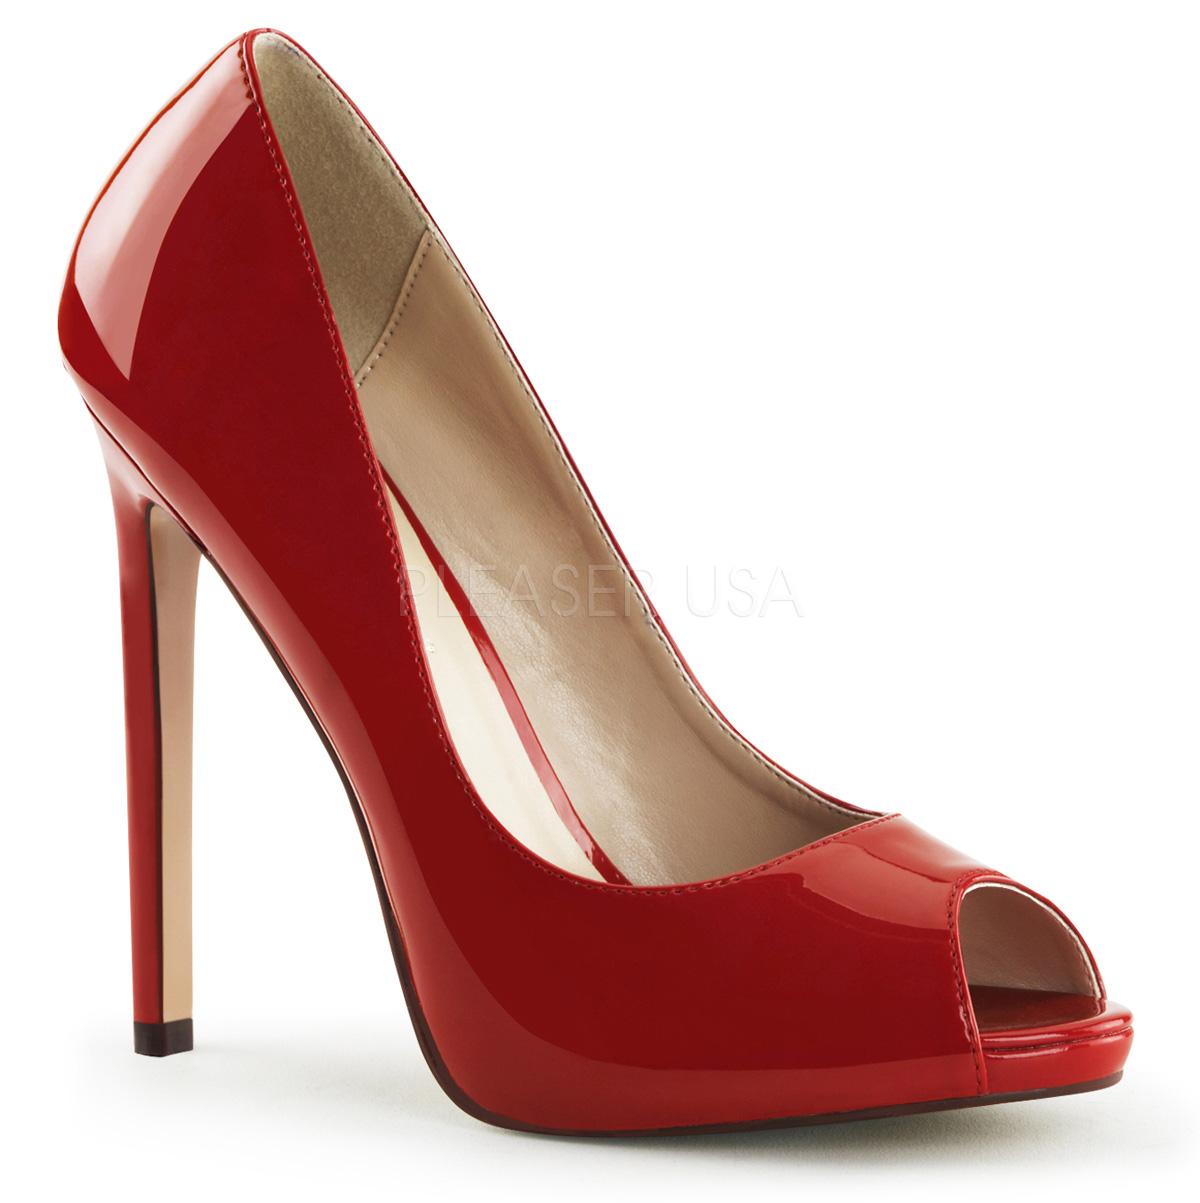 peep toe stiletto high heels mit plateau sexy 42 rot lack. Black Bedroom Furniture Sets. Home Design Ideas